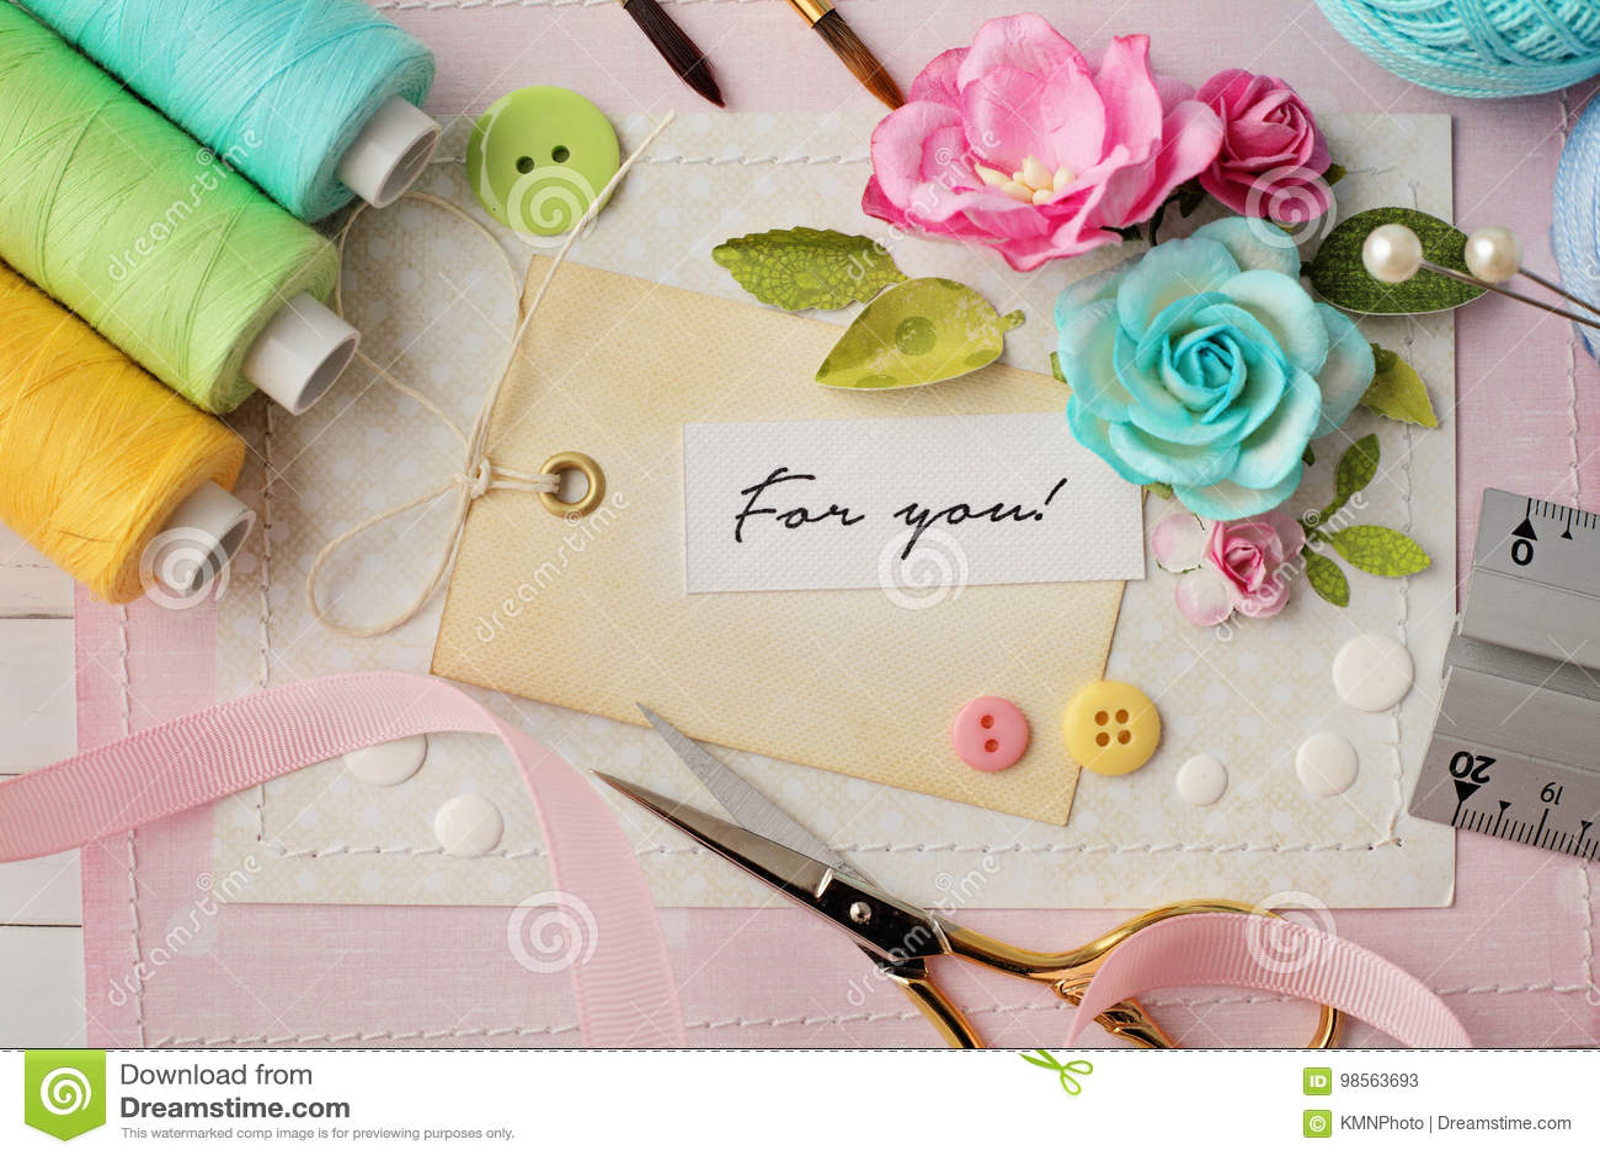 Scrapbook Materials Stock Image Image Of Handmade Paper 98563693